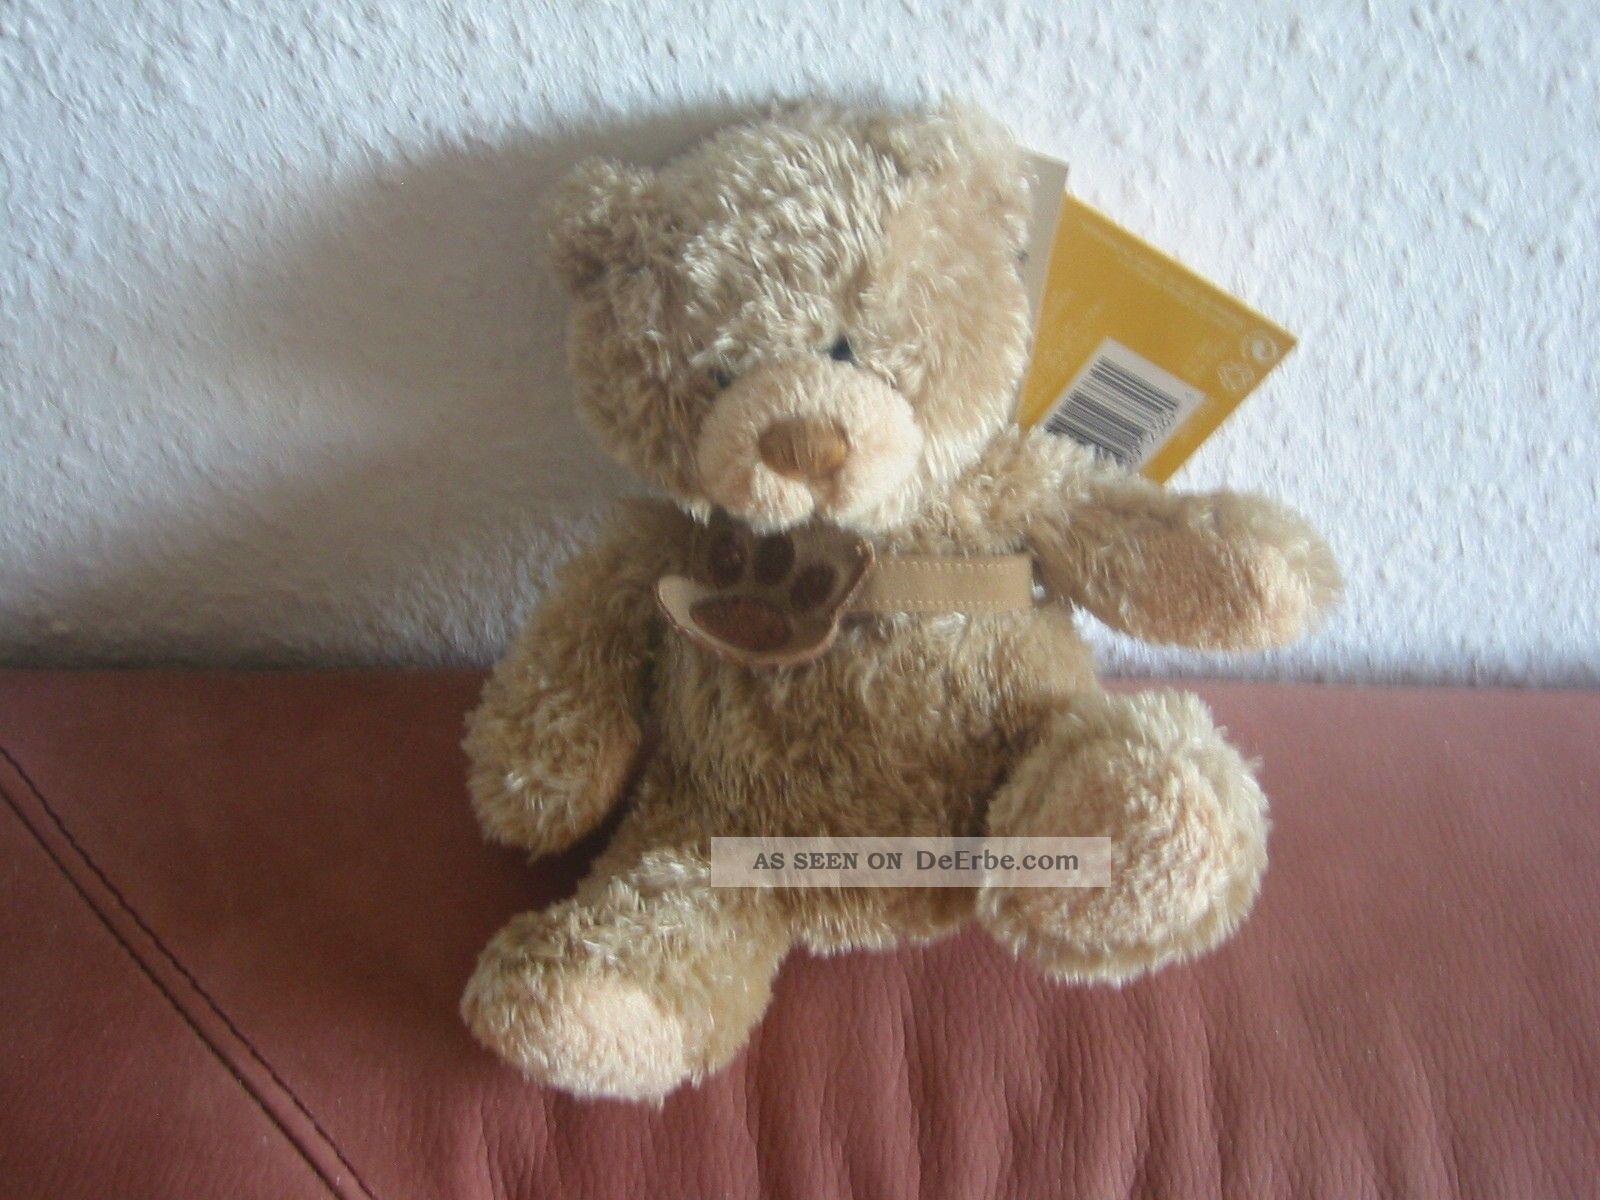 Teddybaer - Teddy - - HÖney Baer - Bestzustand - KÜnstlerarbeit - BÄr Stofftiere & Teddybären Bild